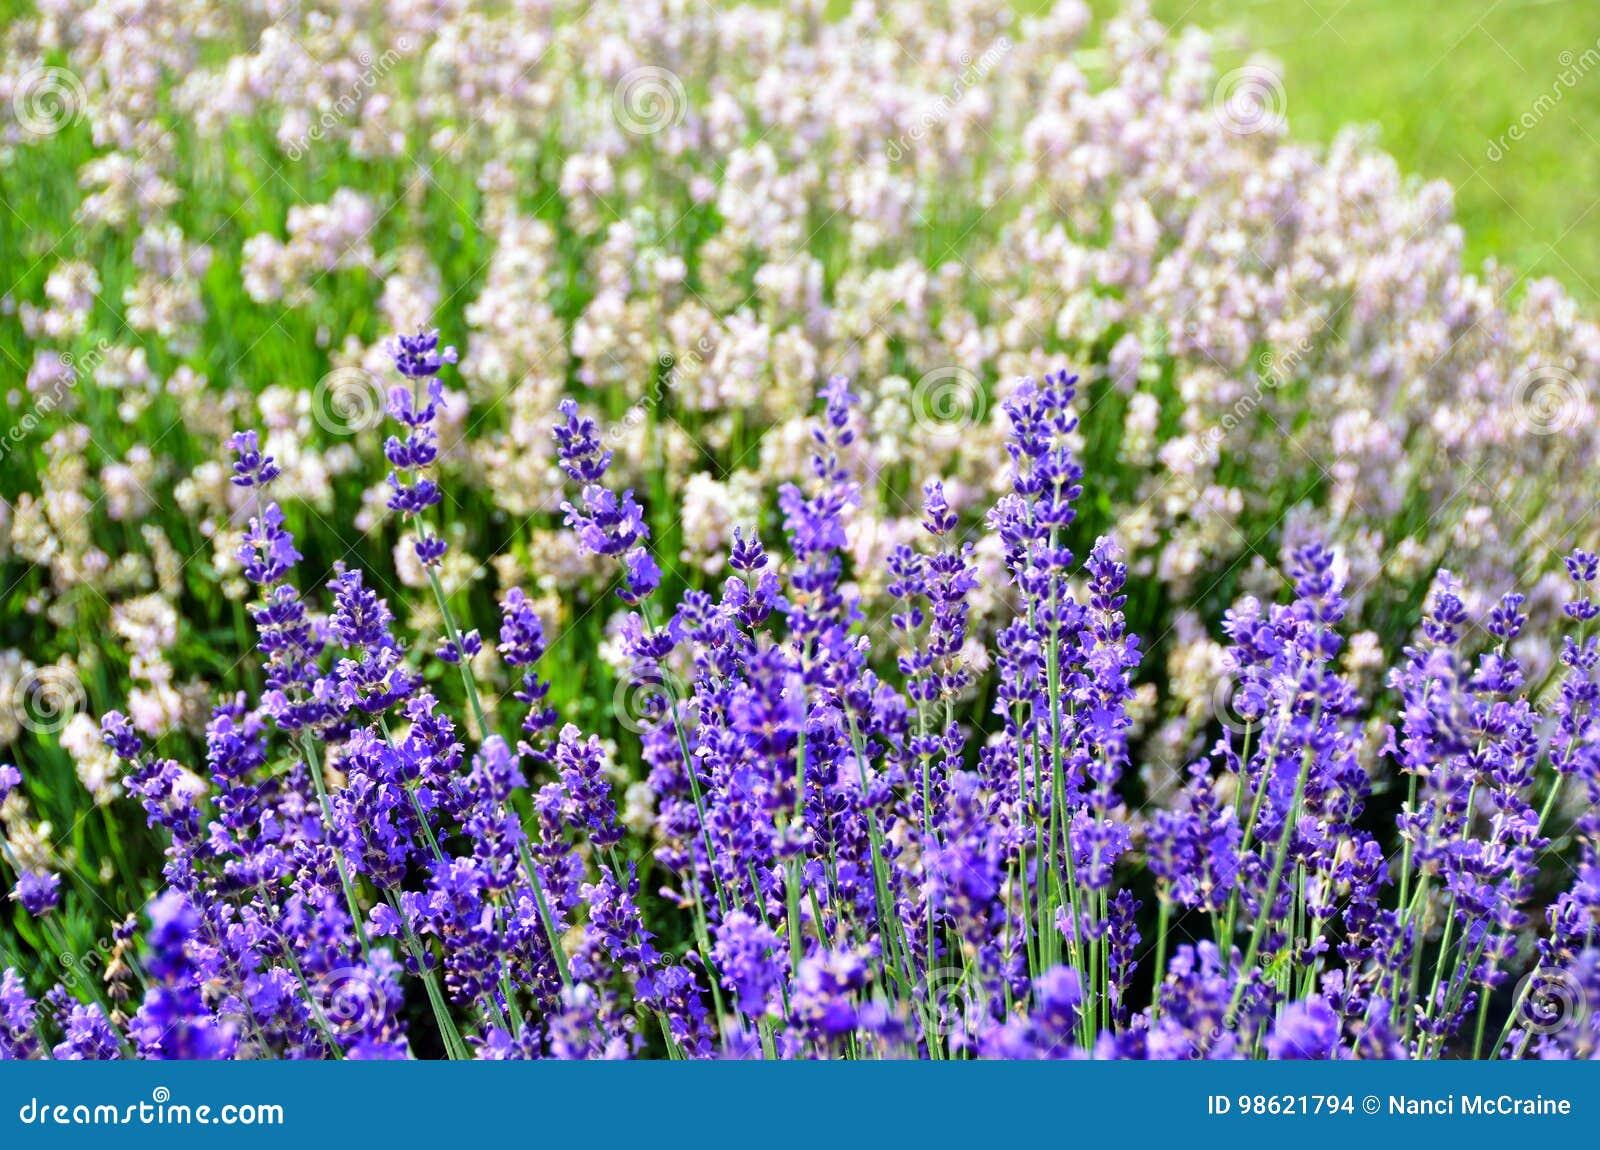 Purple And White Lavender Flowers Lavandula Angustifolia Stock Photo